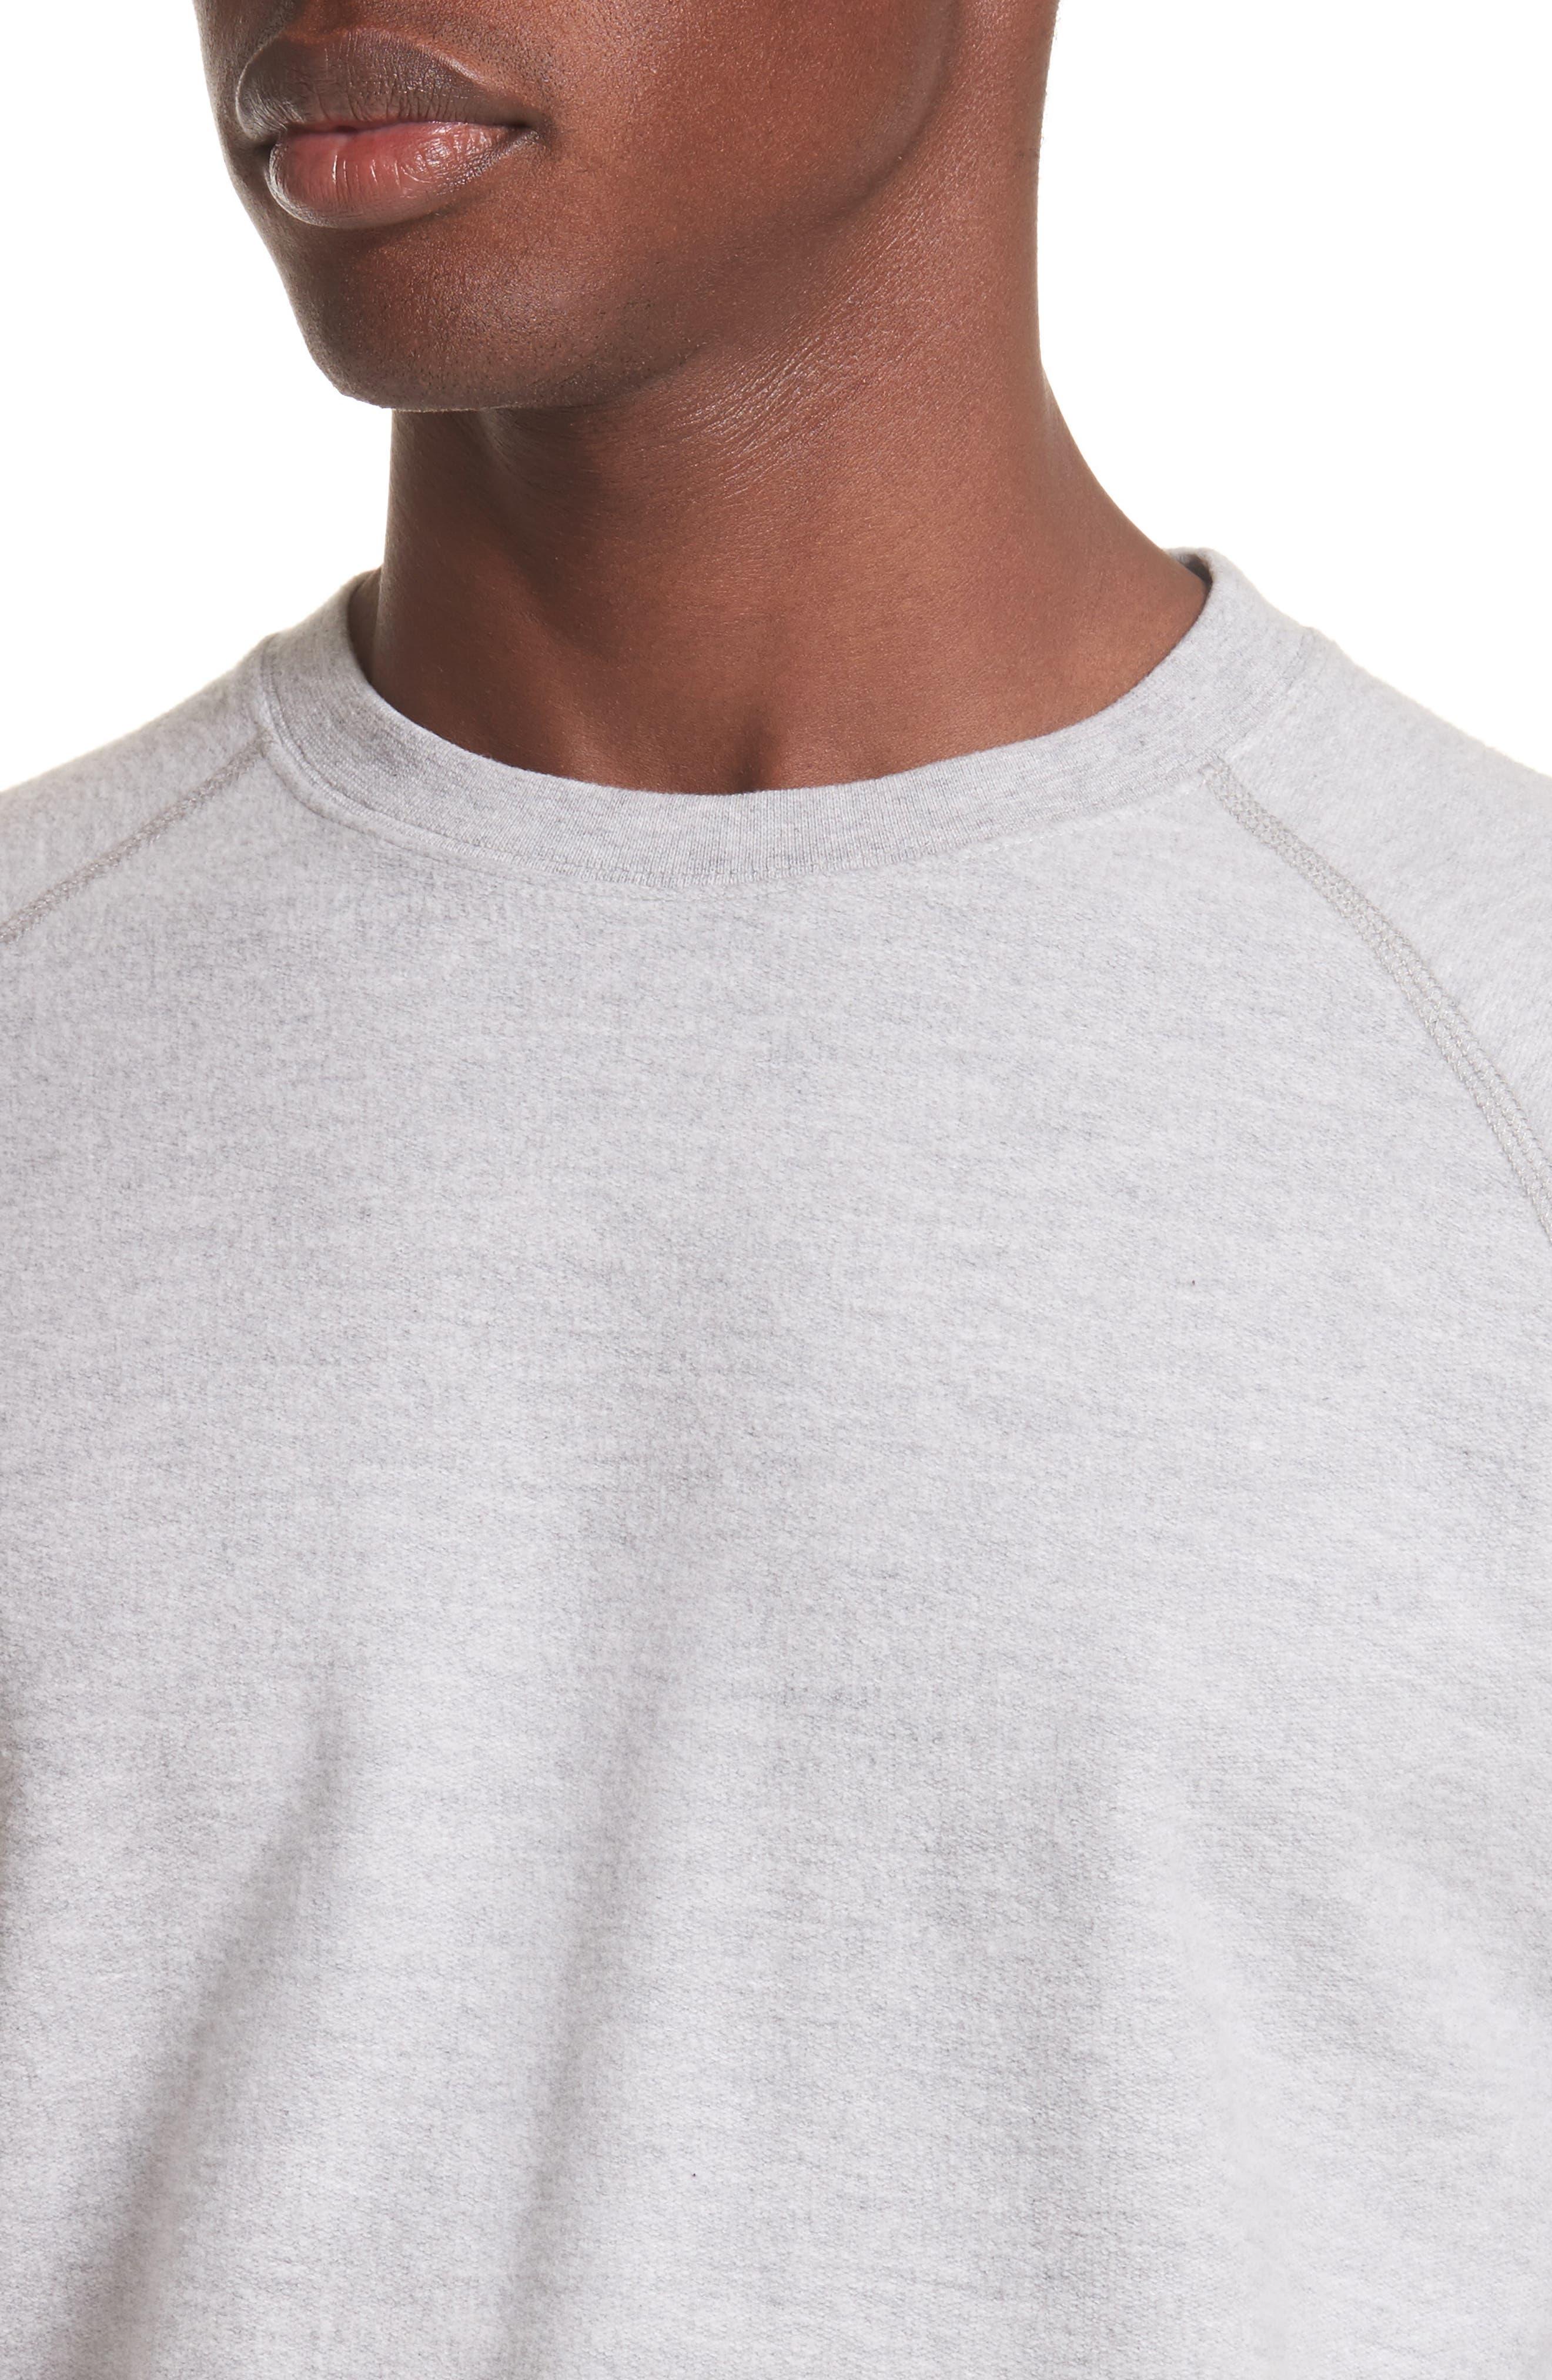 Victor Brushed Cotton T-Shirt,                             Alternate thumbnail 4, color,                             050